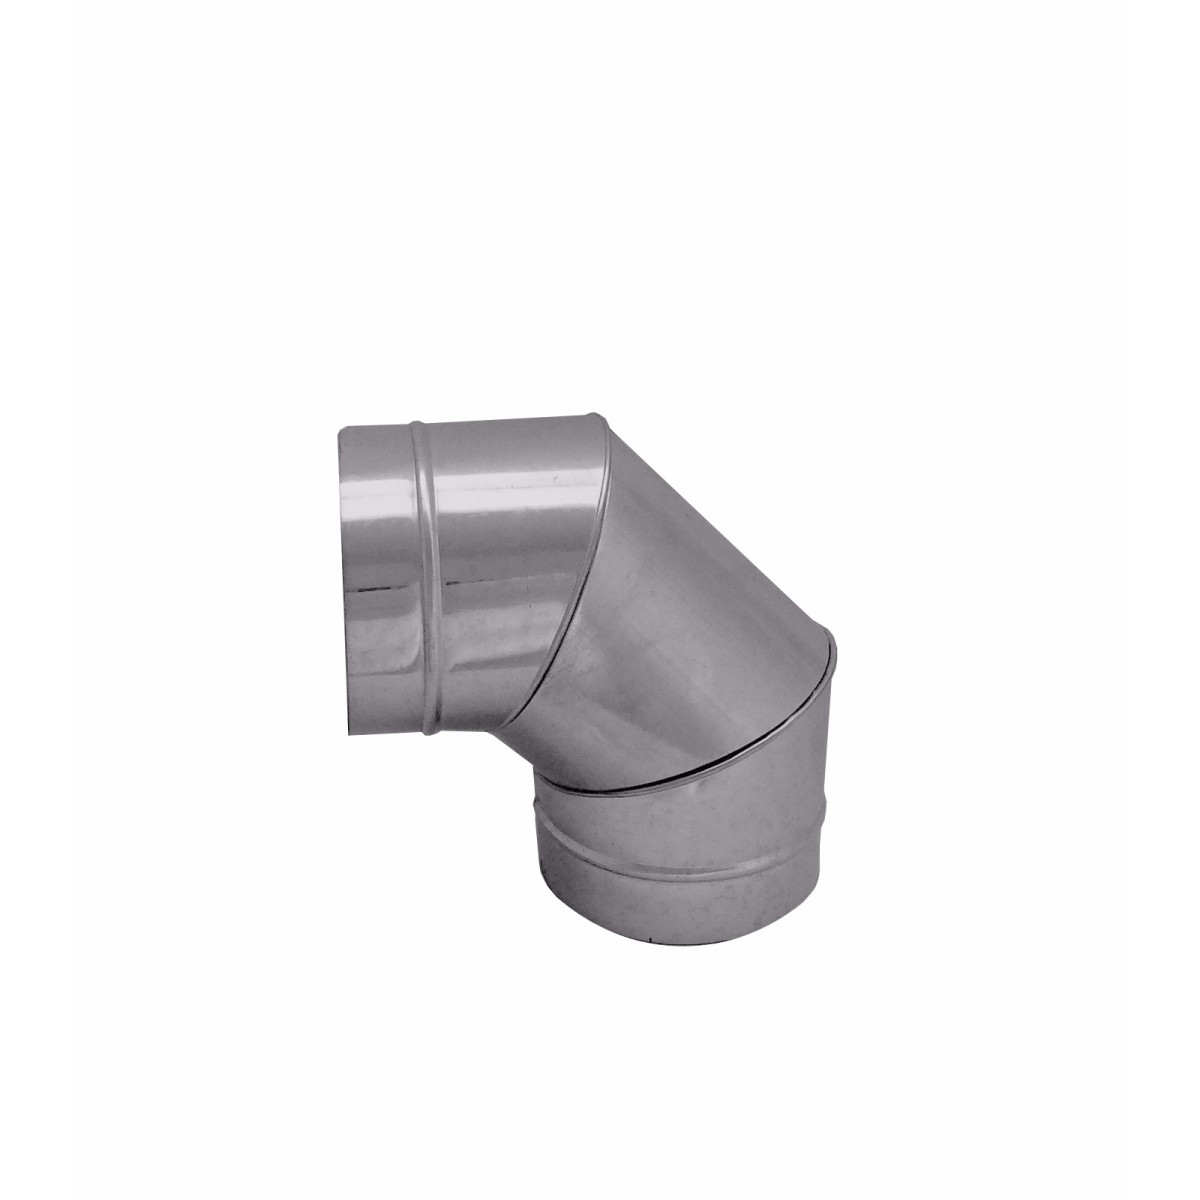 Curva / cotovelo galvanizada 90° de 180 mm de diâmetro  - Galvocalhas